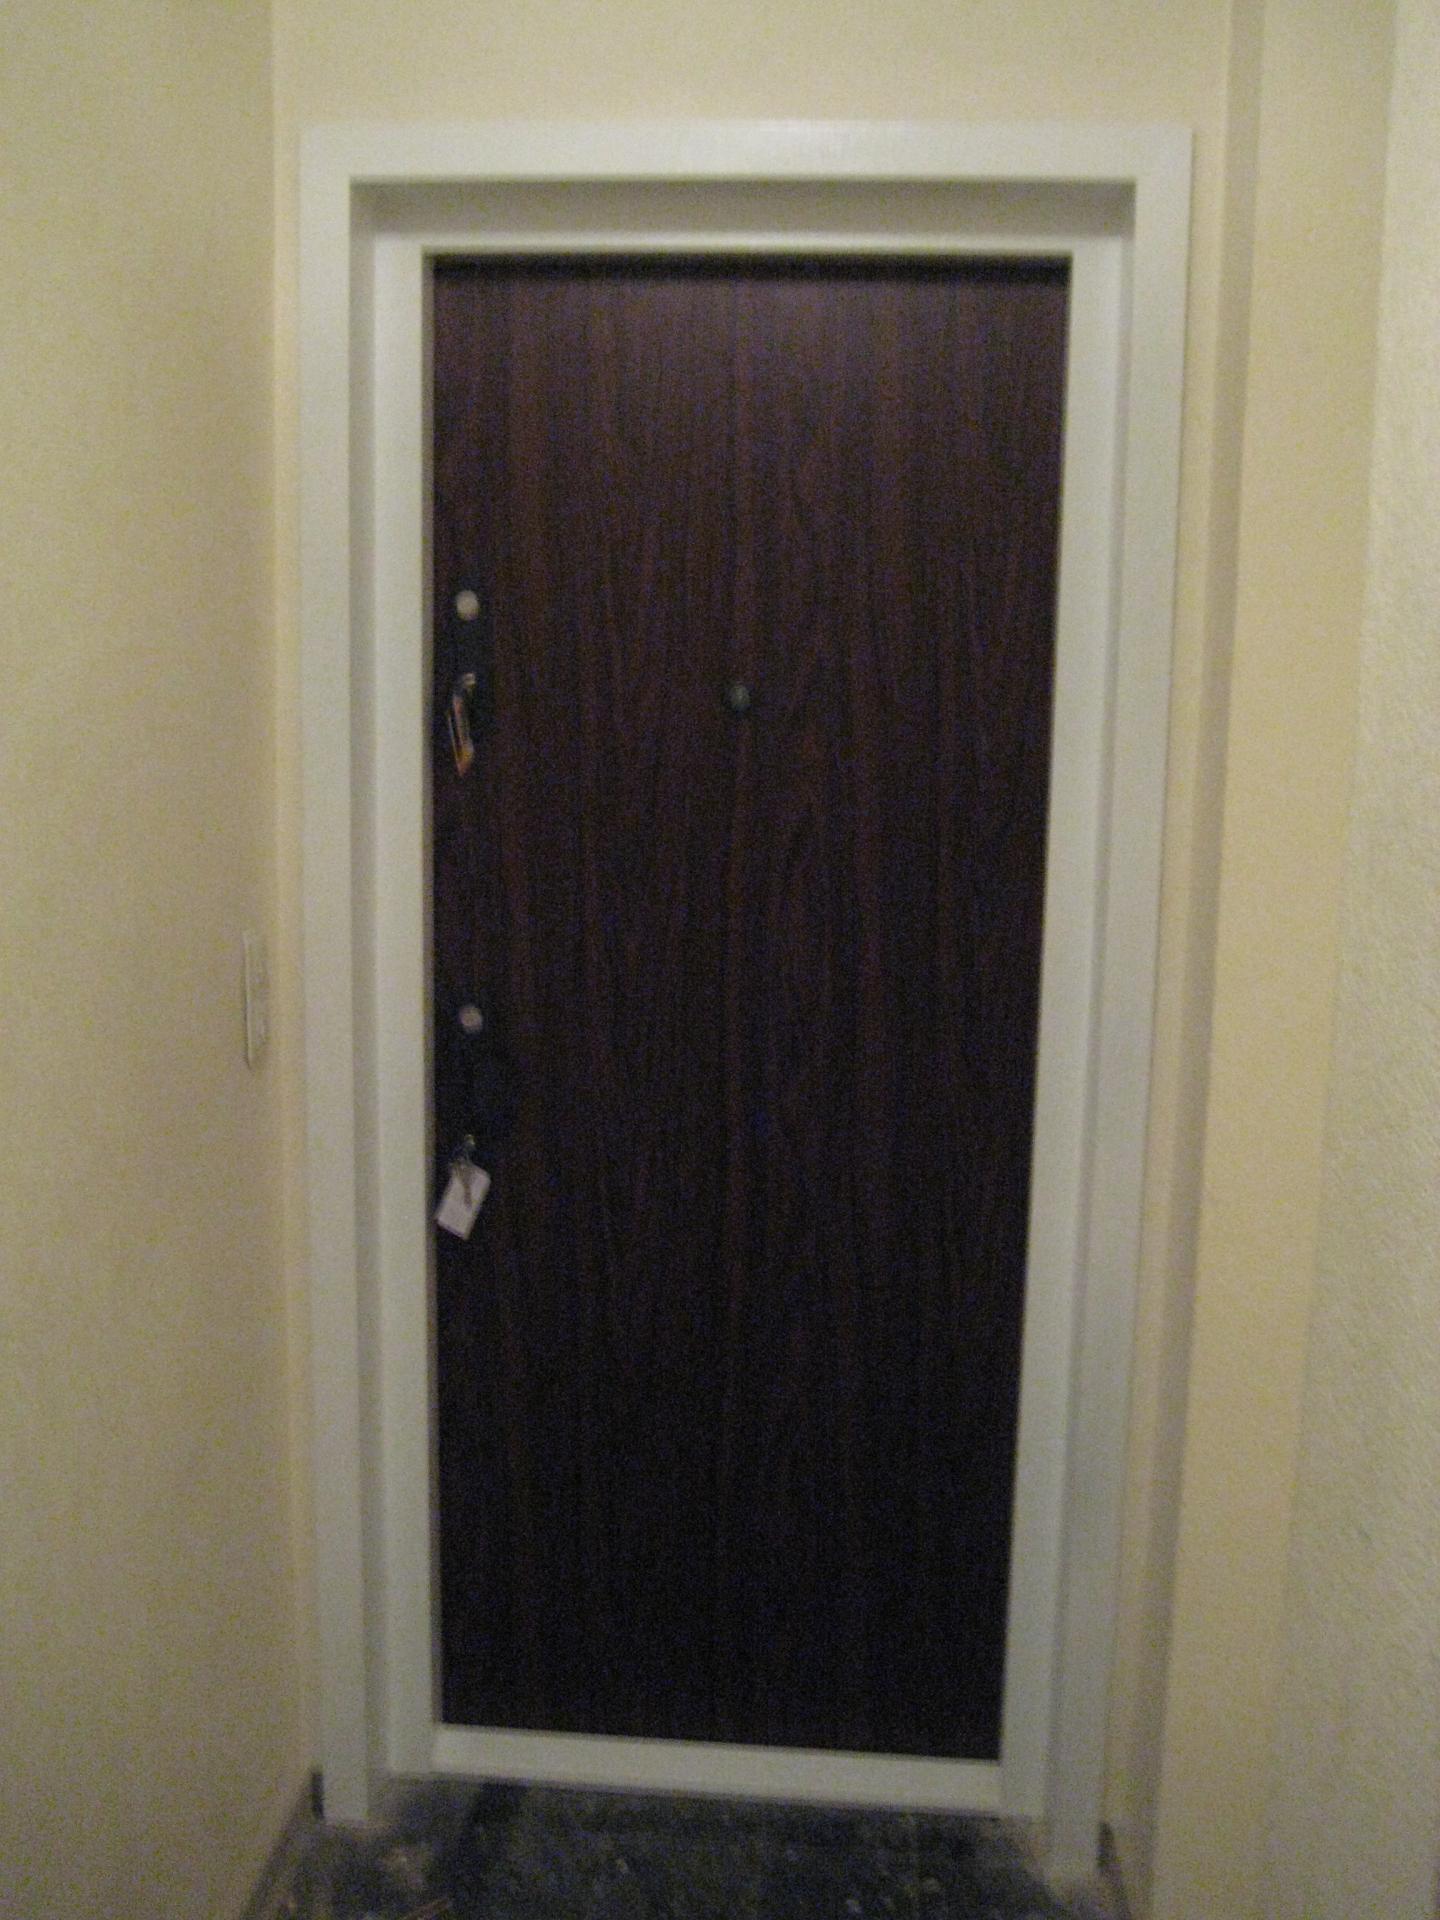 Aweinspiring Porte Blinder Clues Kvazarinfo - Porte placard coulissante jumelé avec blindage